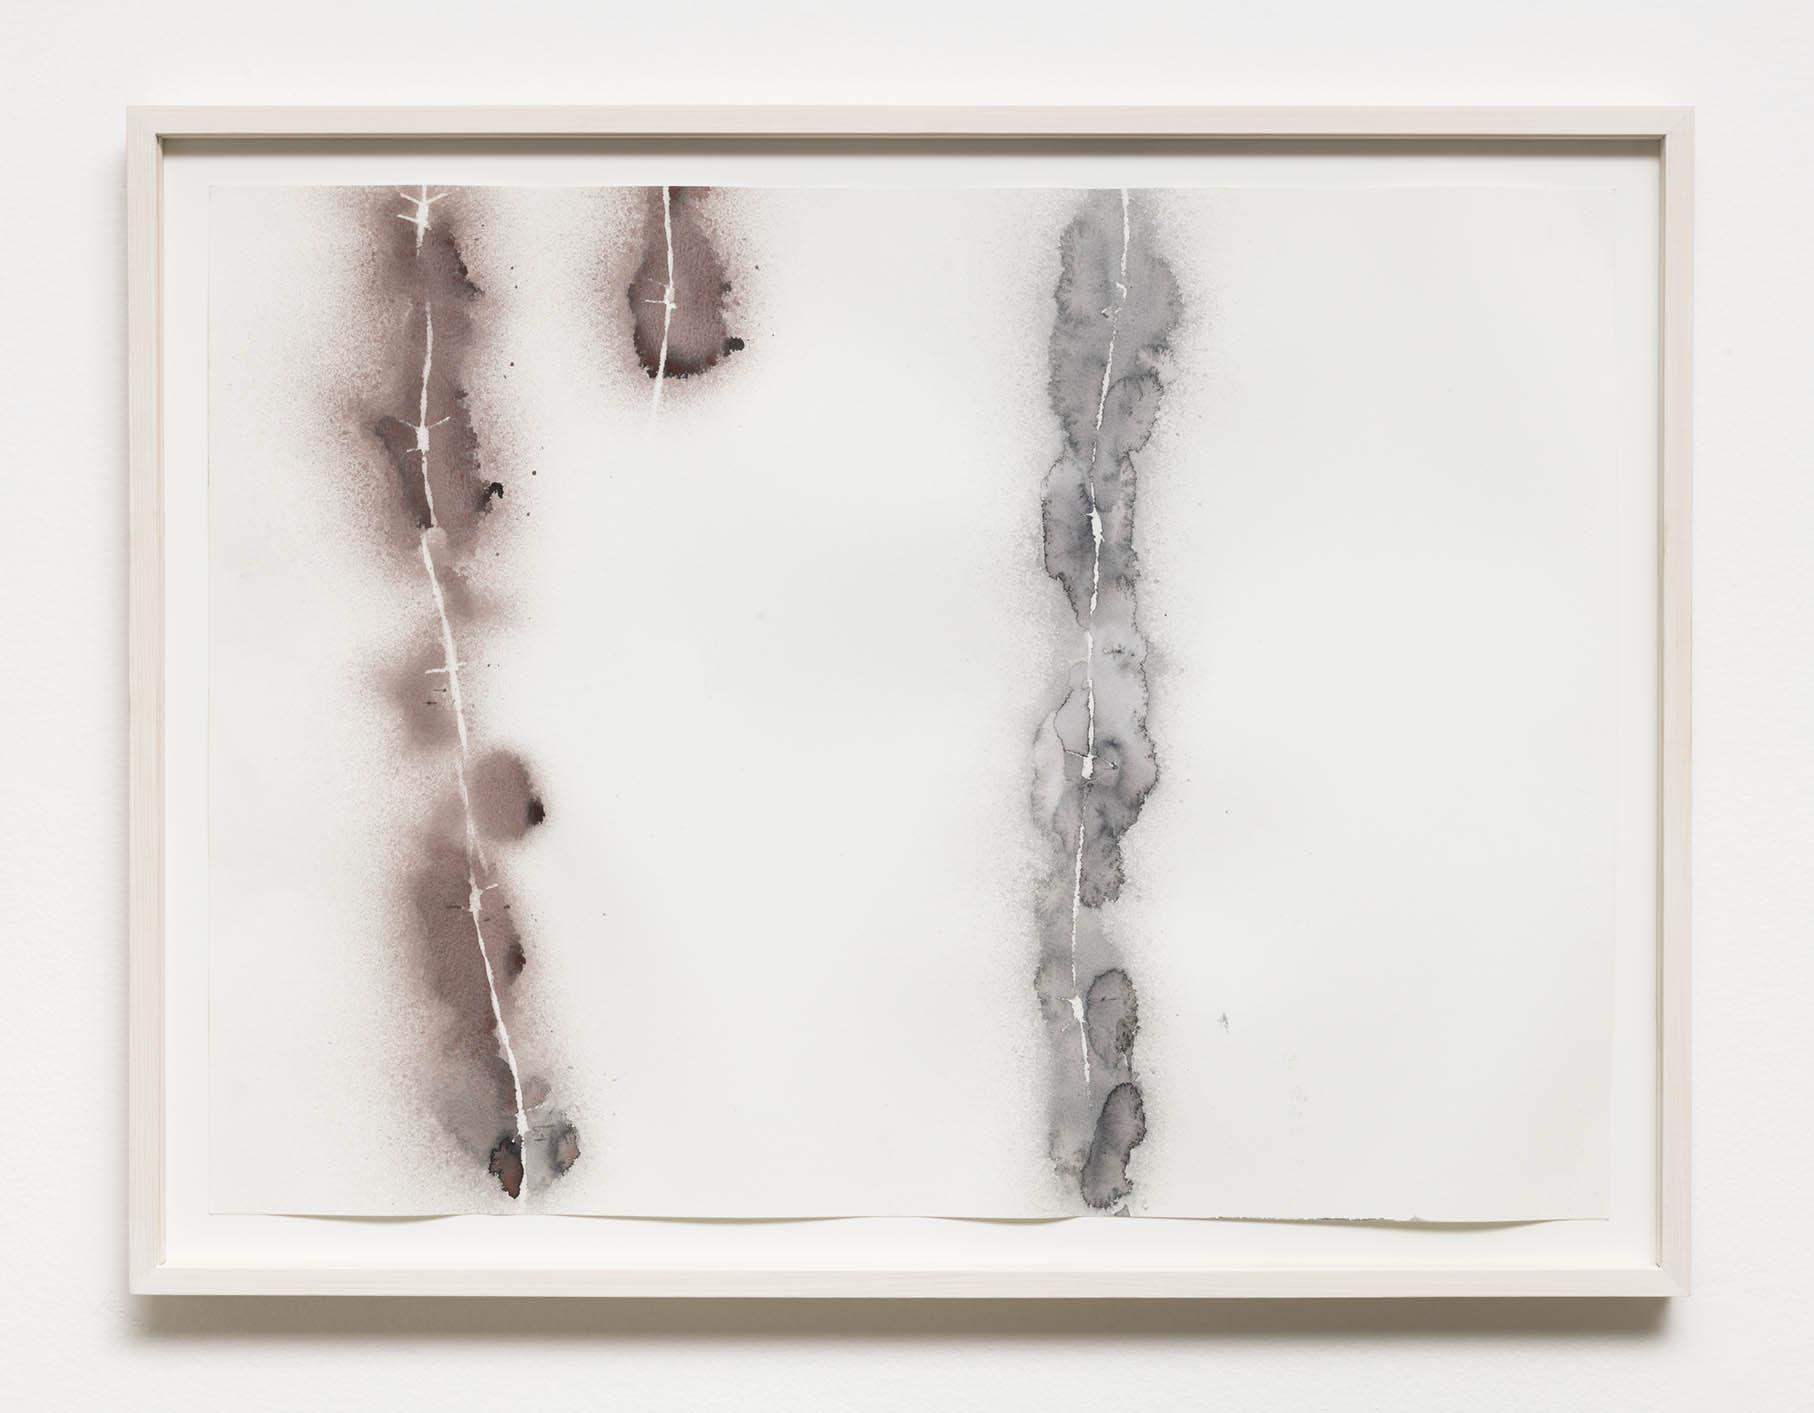 Variações de Correntes em Cor  |  Chain Variations in Color,  2019   aquarela  |  watercolor   54 x 75 cm |  2117/64 x 29 17/32 in